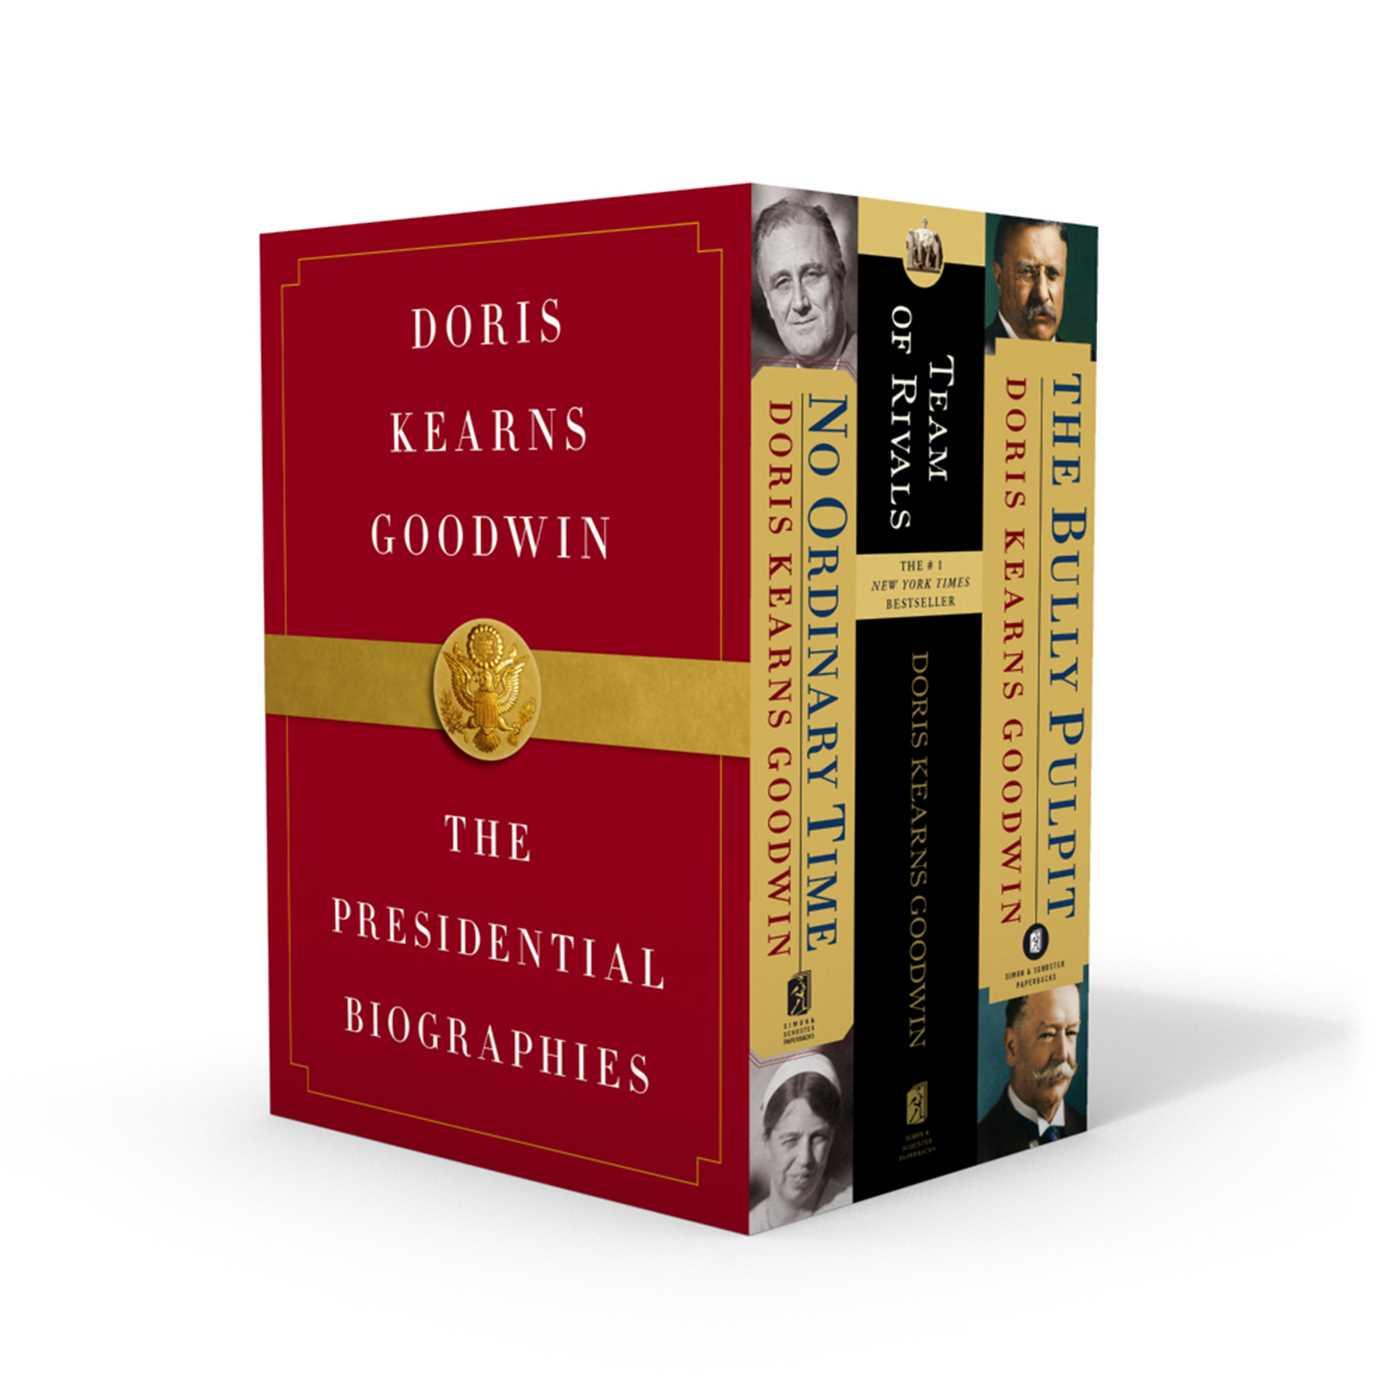 Doris kearns goodwin the presidential biographies 9781982103224 hr